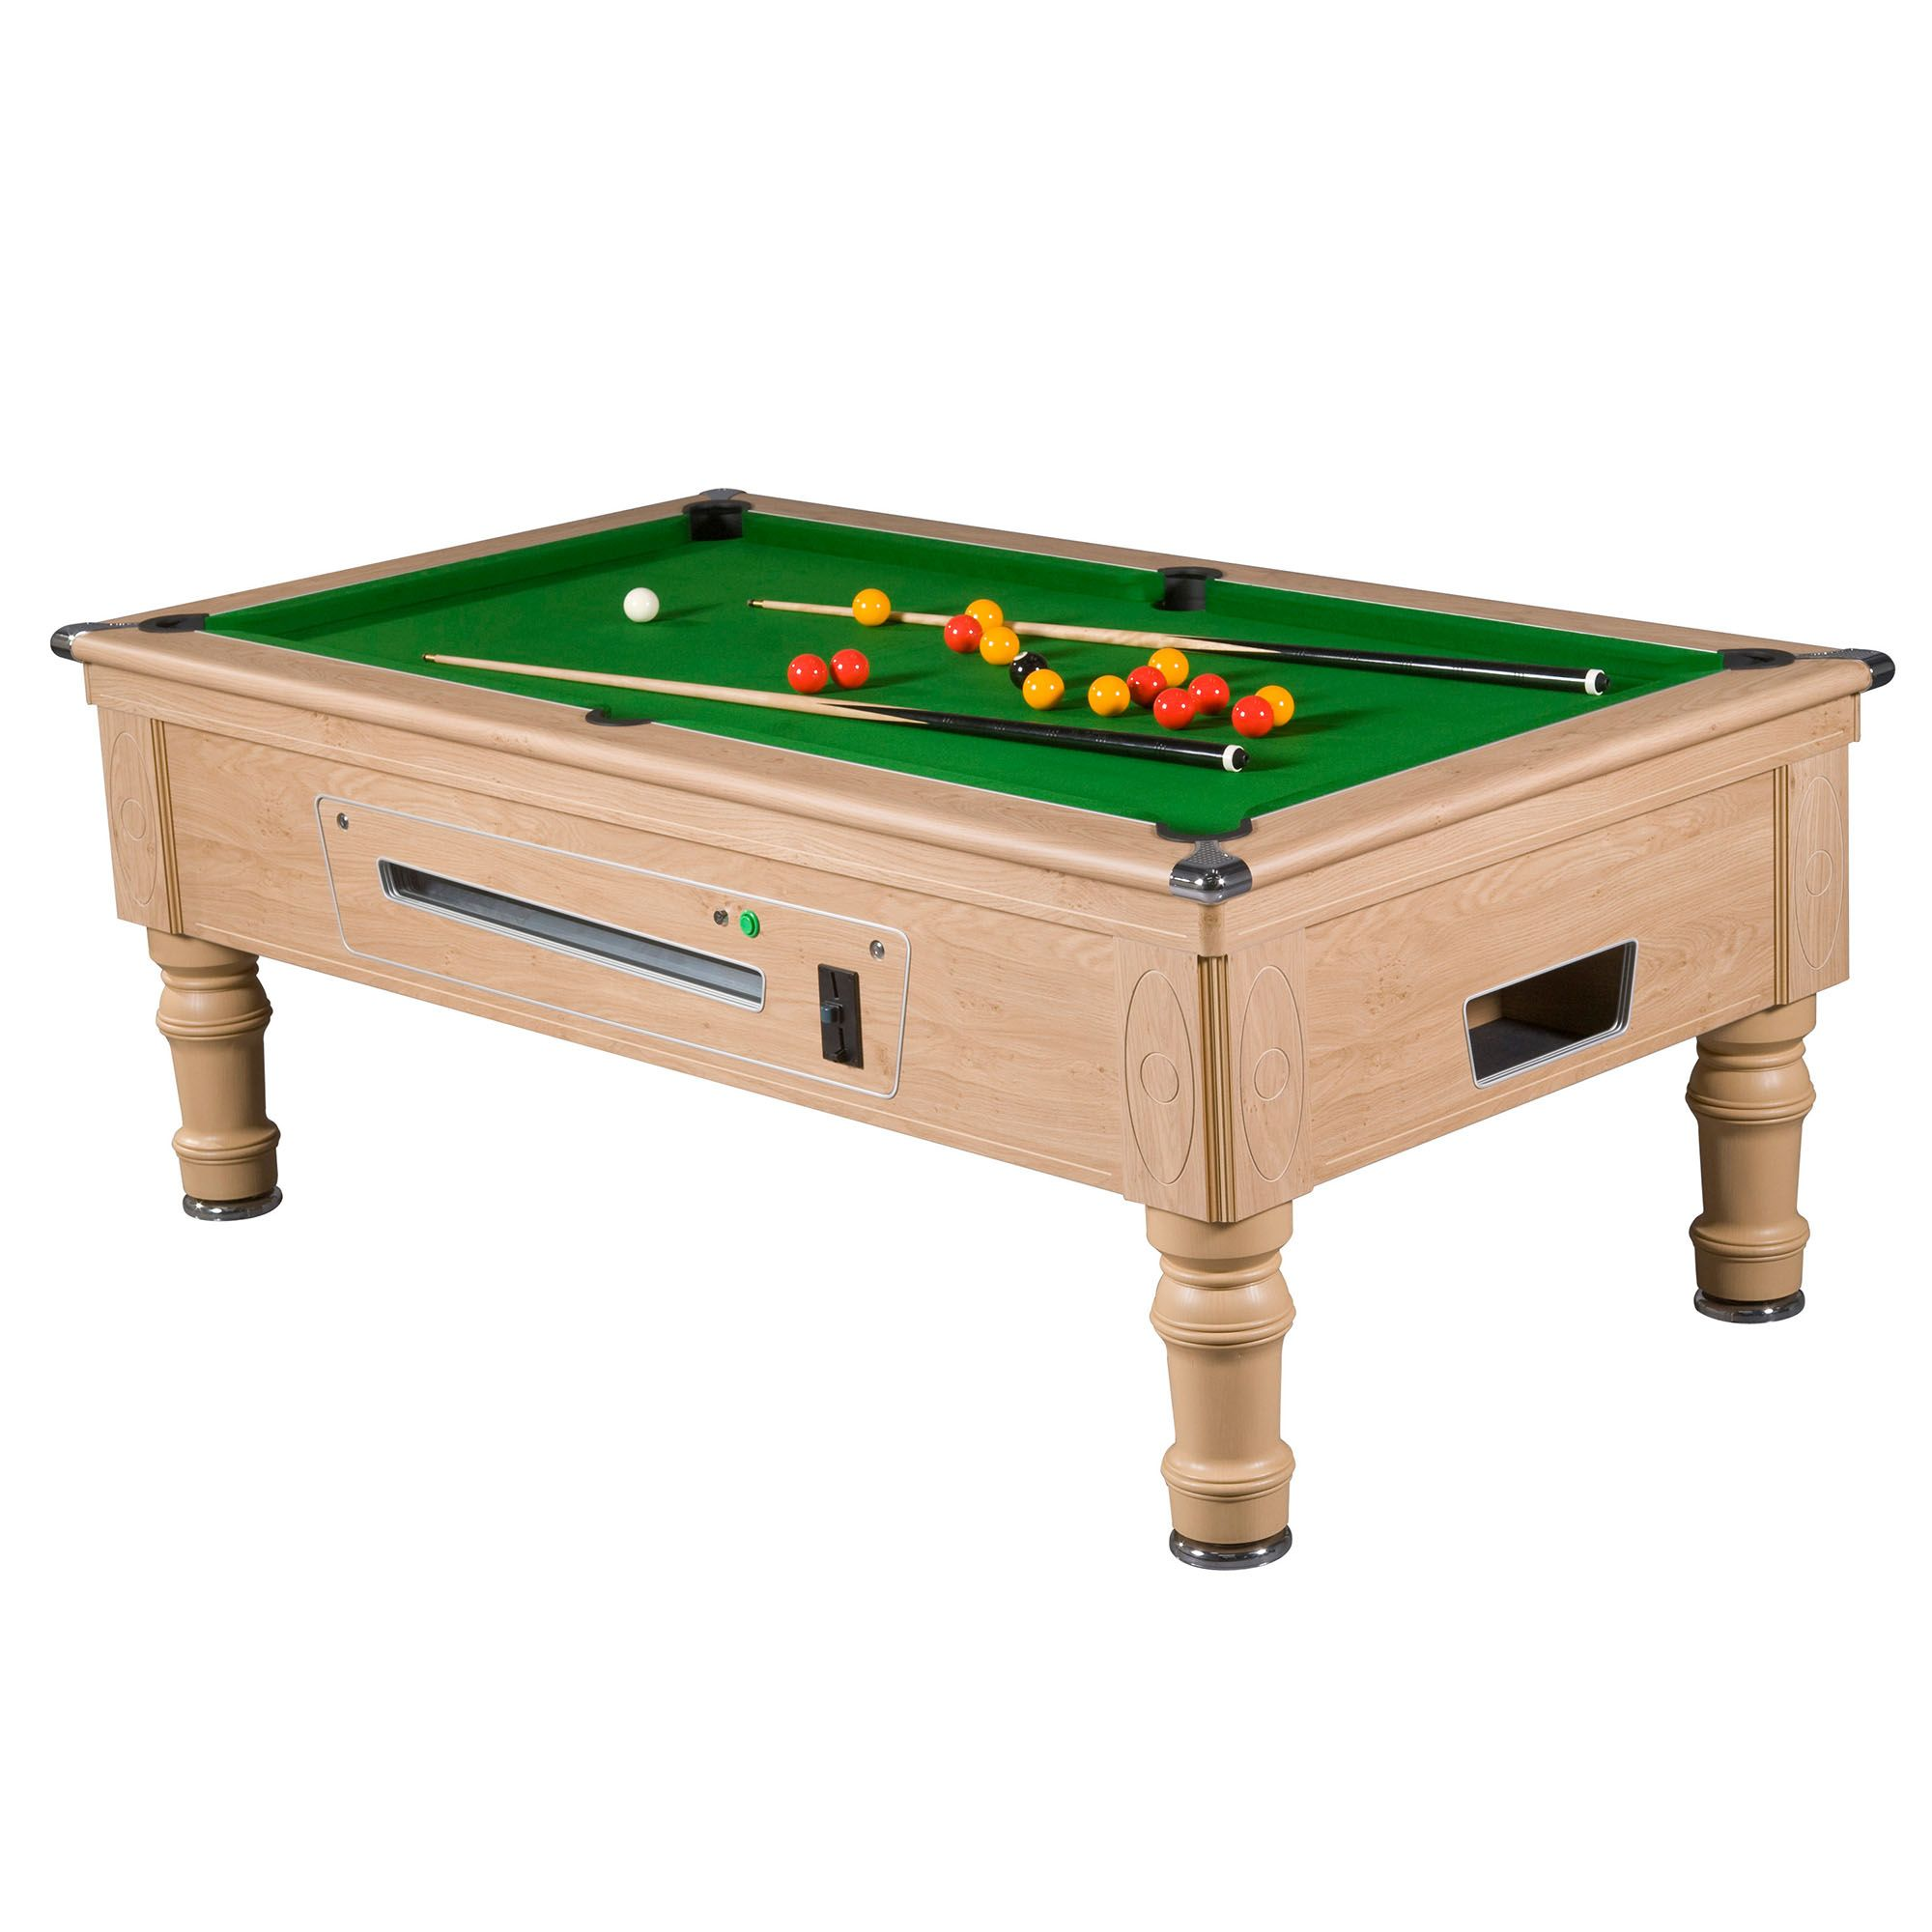 Mightymast 7ft prince slate bed english pool table for 1 slate pool table